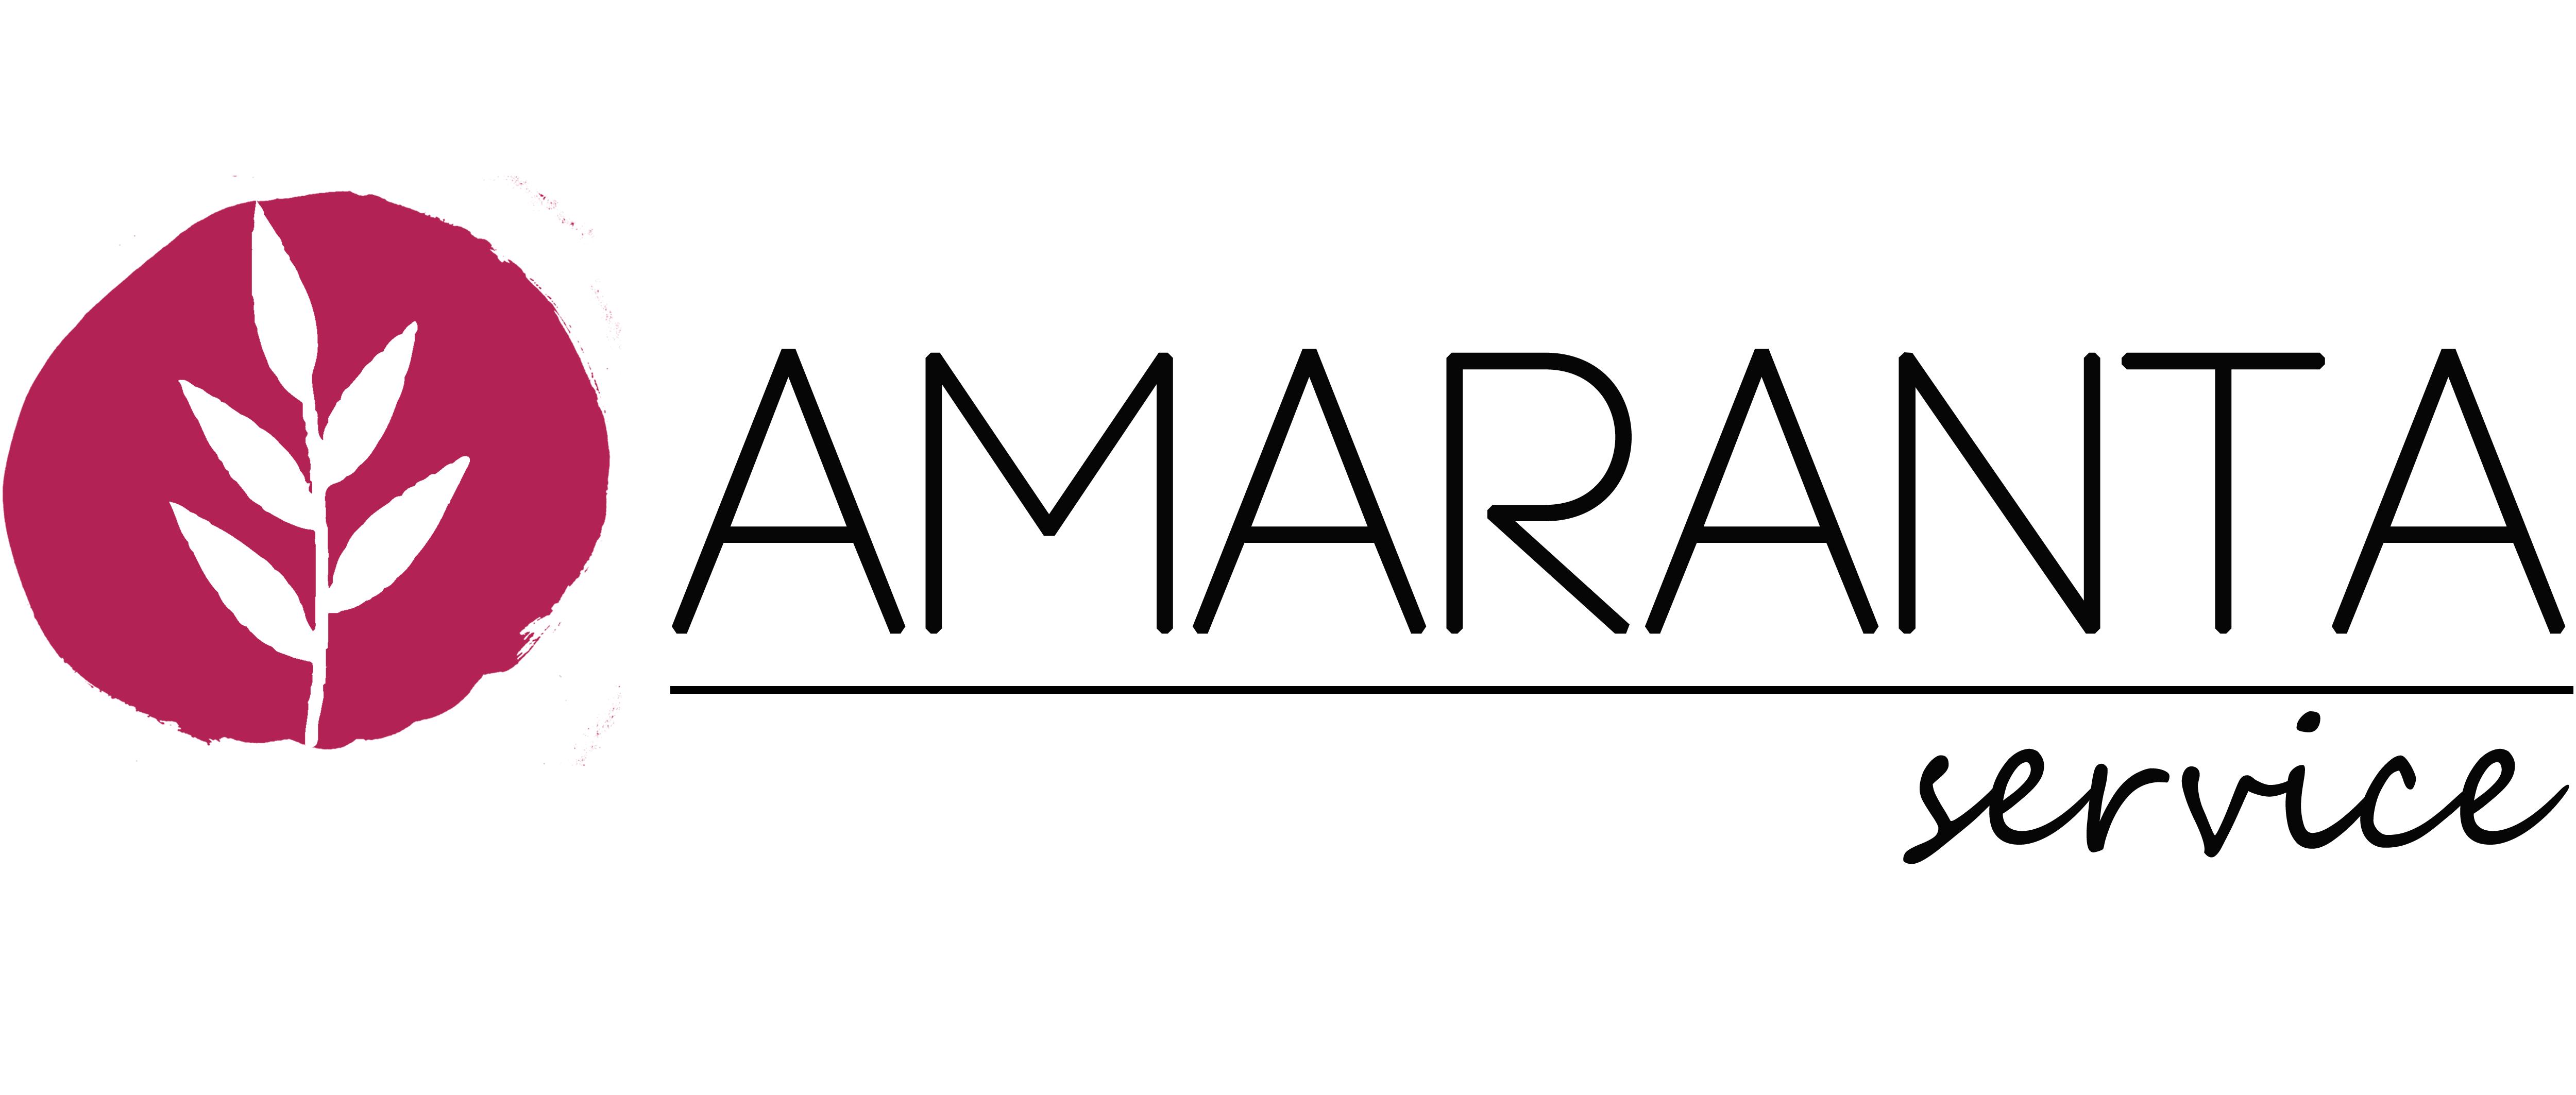 Amaranta Service